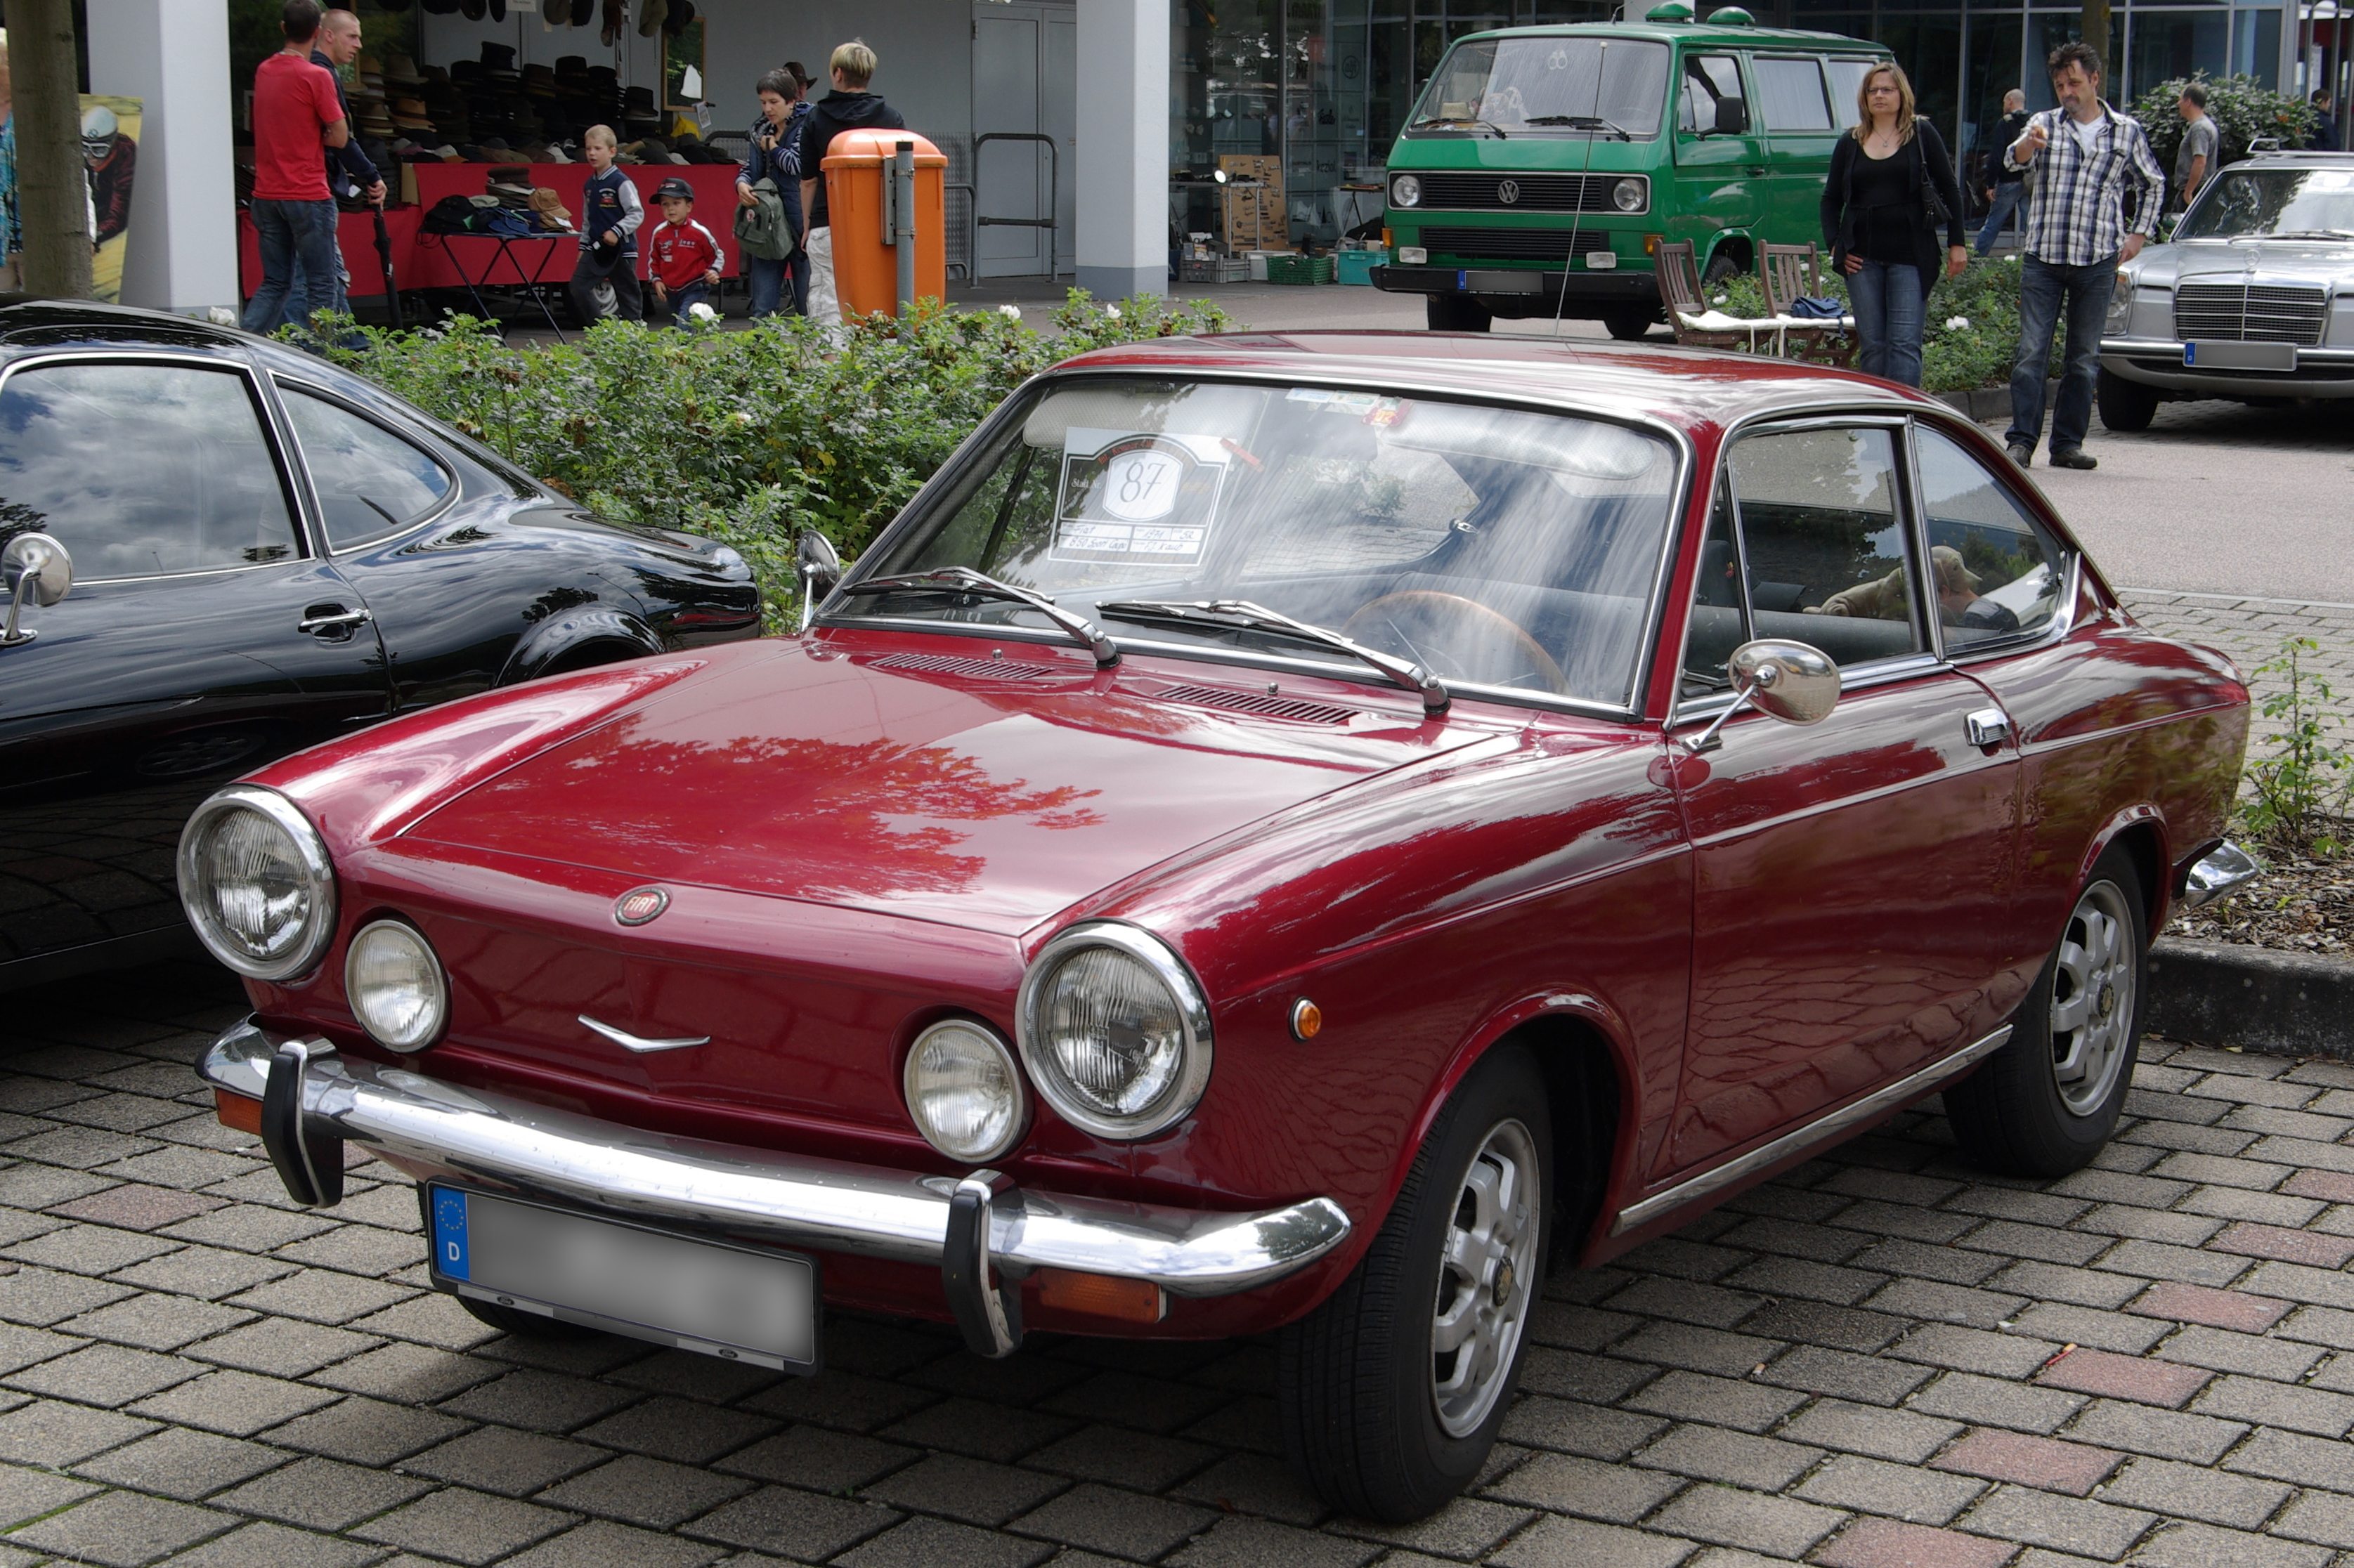 File Fiat 850 Sport Coupe 2012 07 15 14 58 57 Jpg